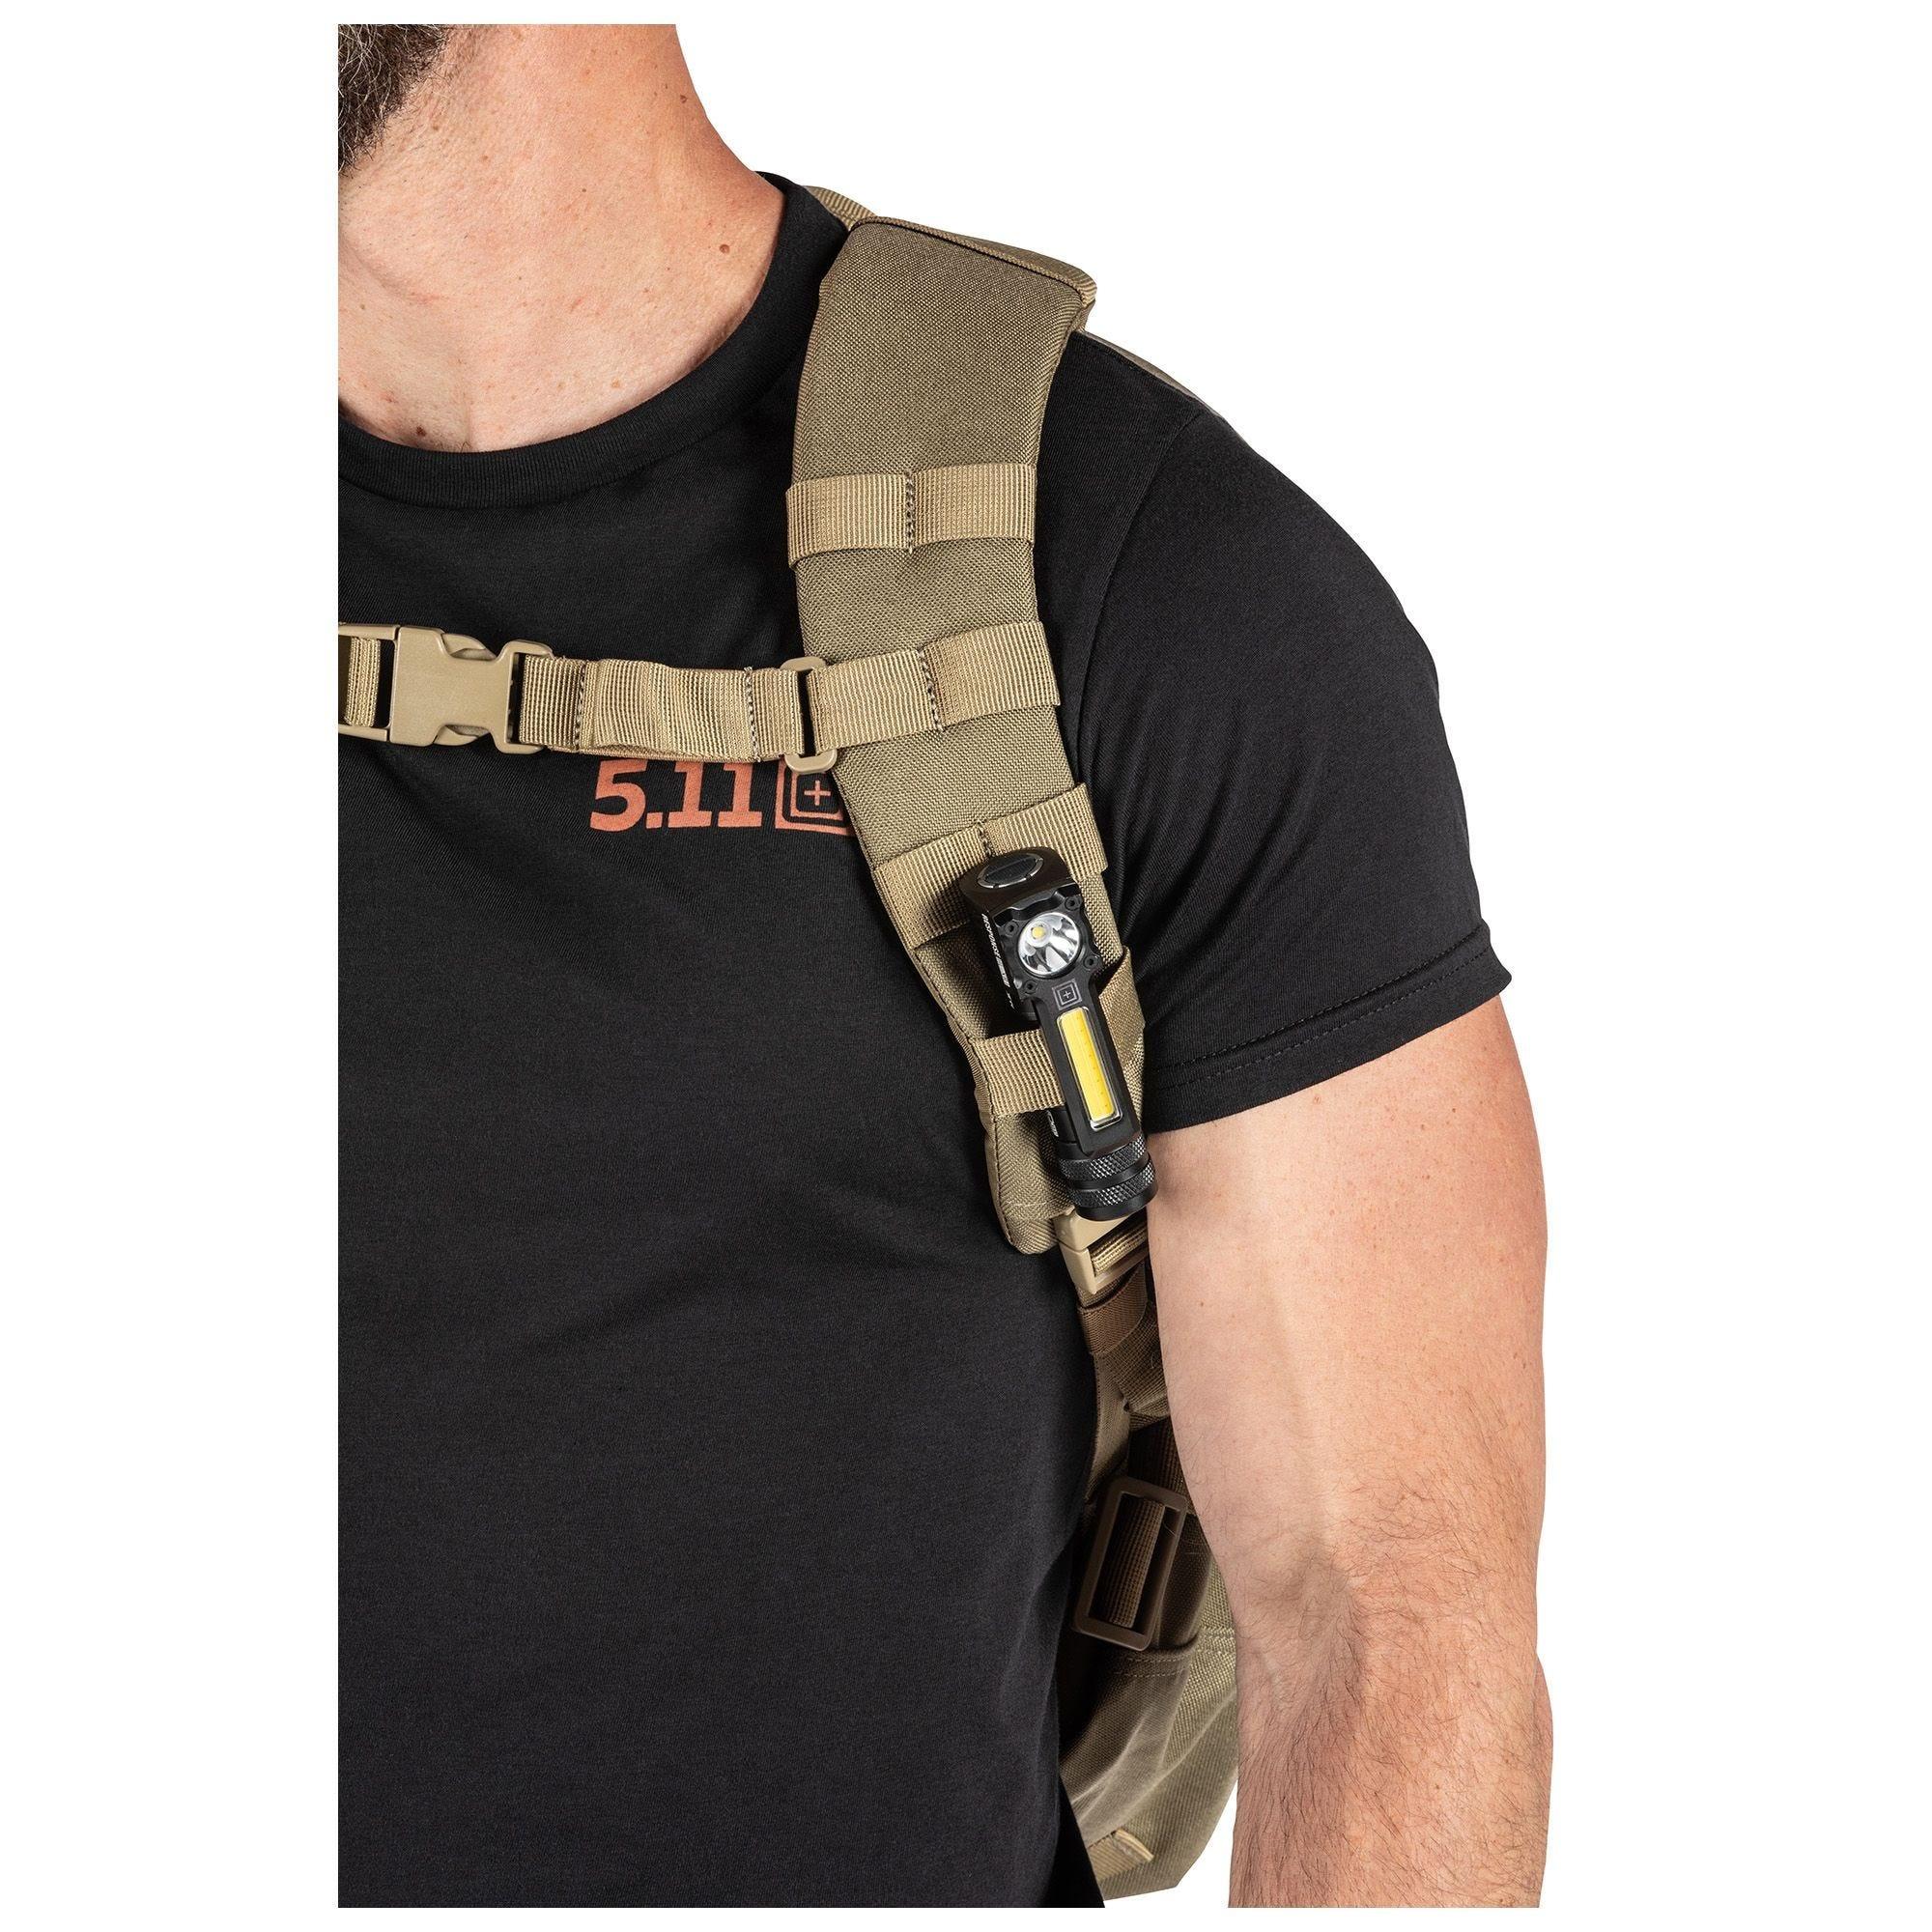 5.11 Tactical 5.11 Tactical Response HL XR1 Headlamp